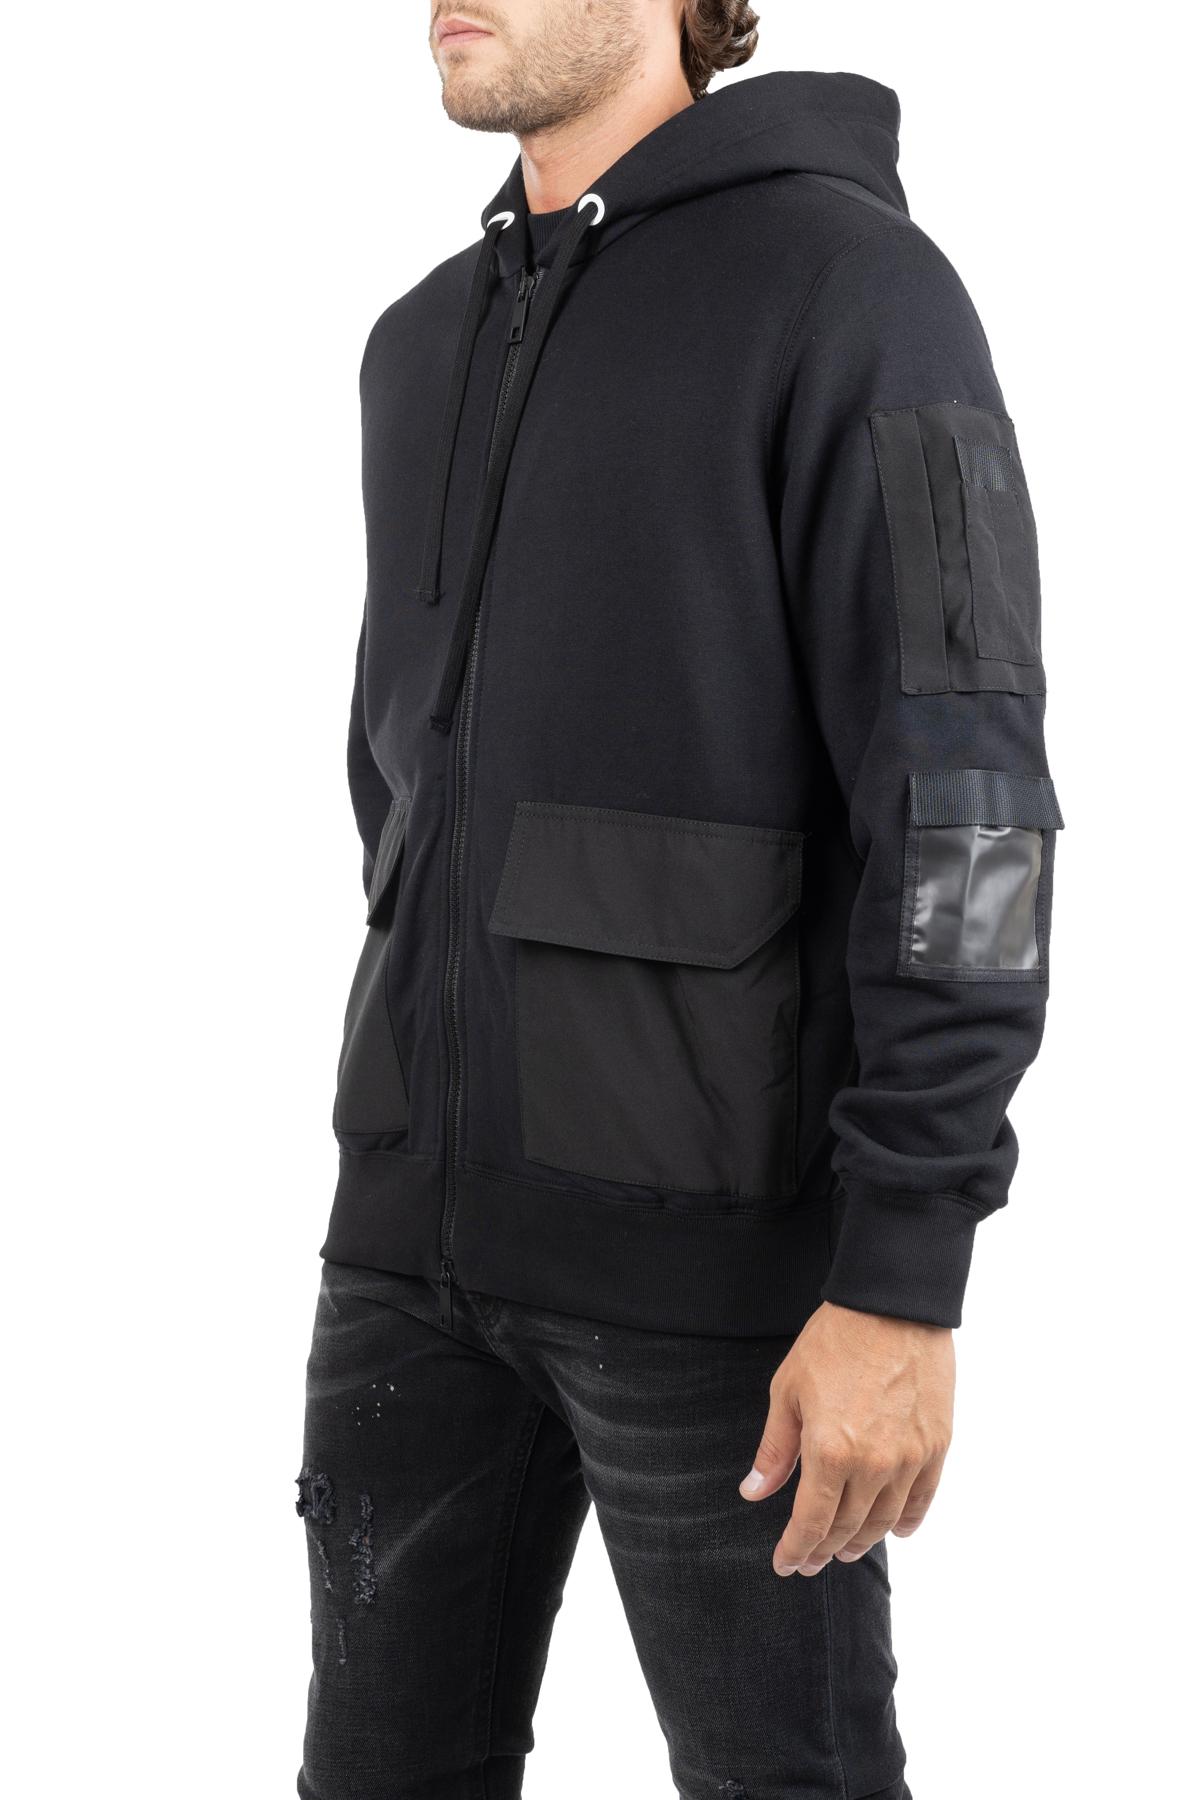 BLACK COTTON SWEATSHIRT WITH WATERPROOF FABRIC DETAILS PAOLO PECORA | Sweatshirts | E06141099000